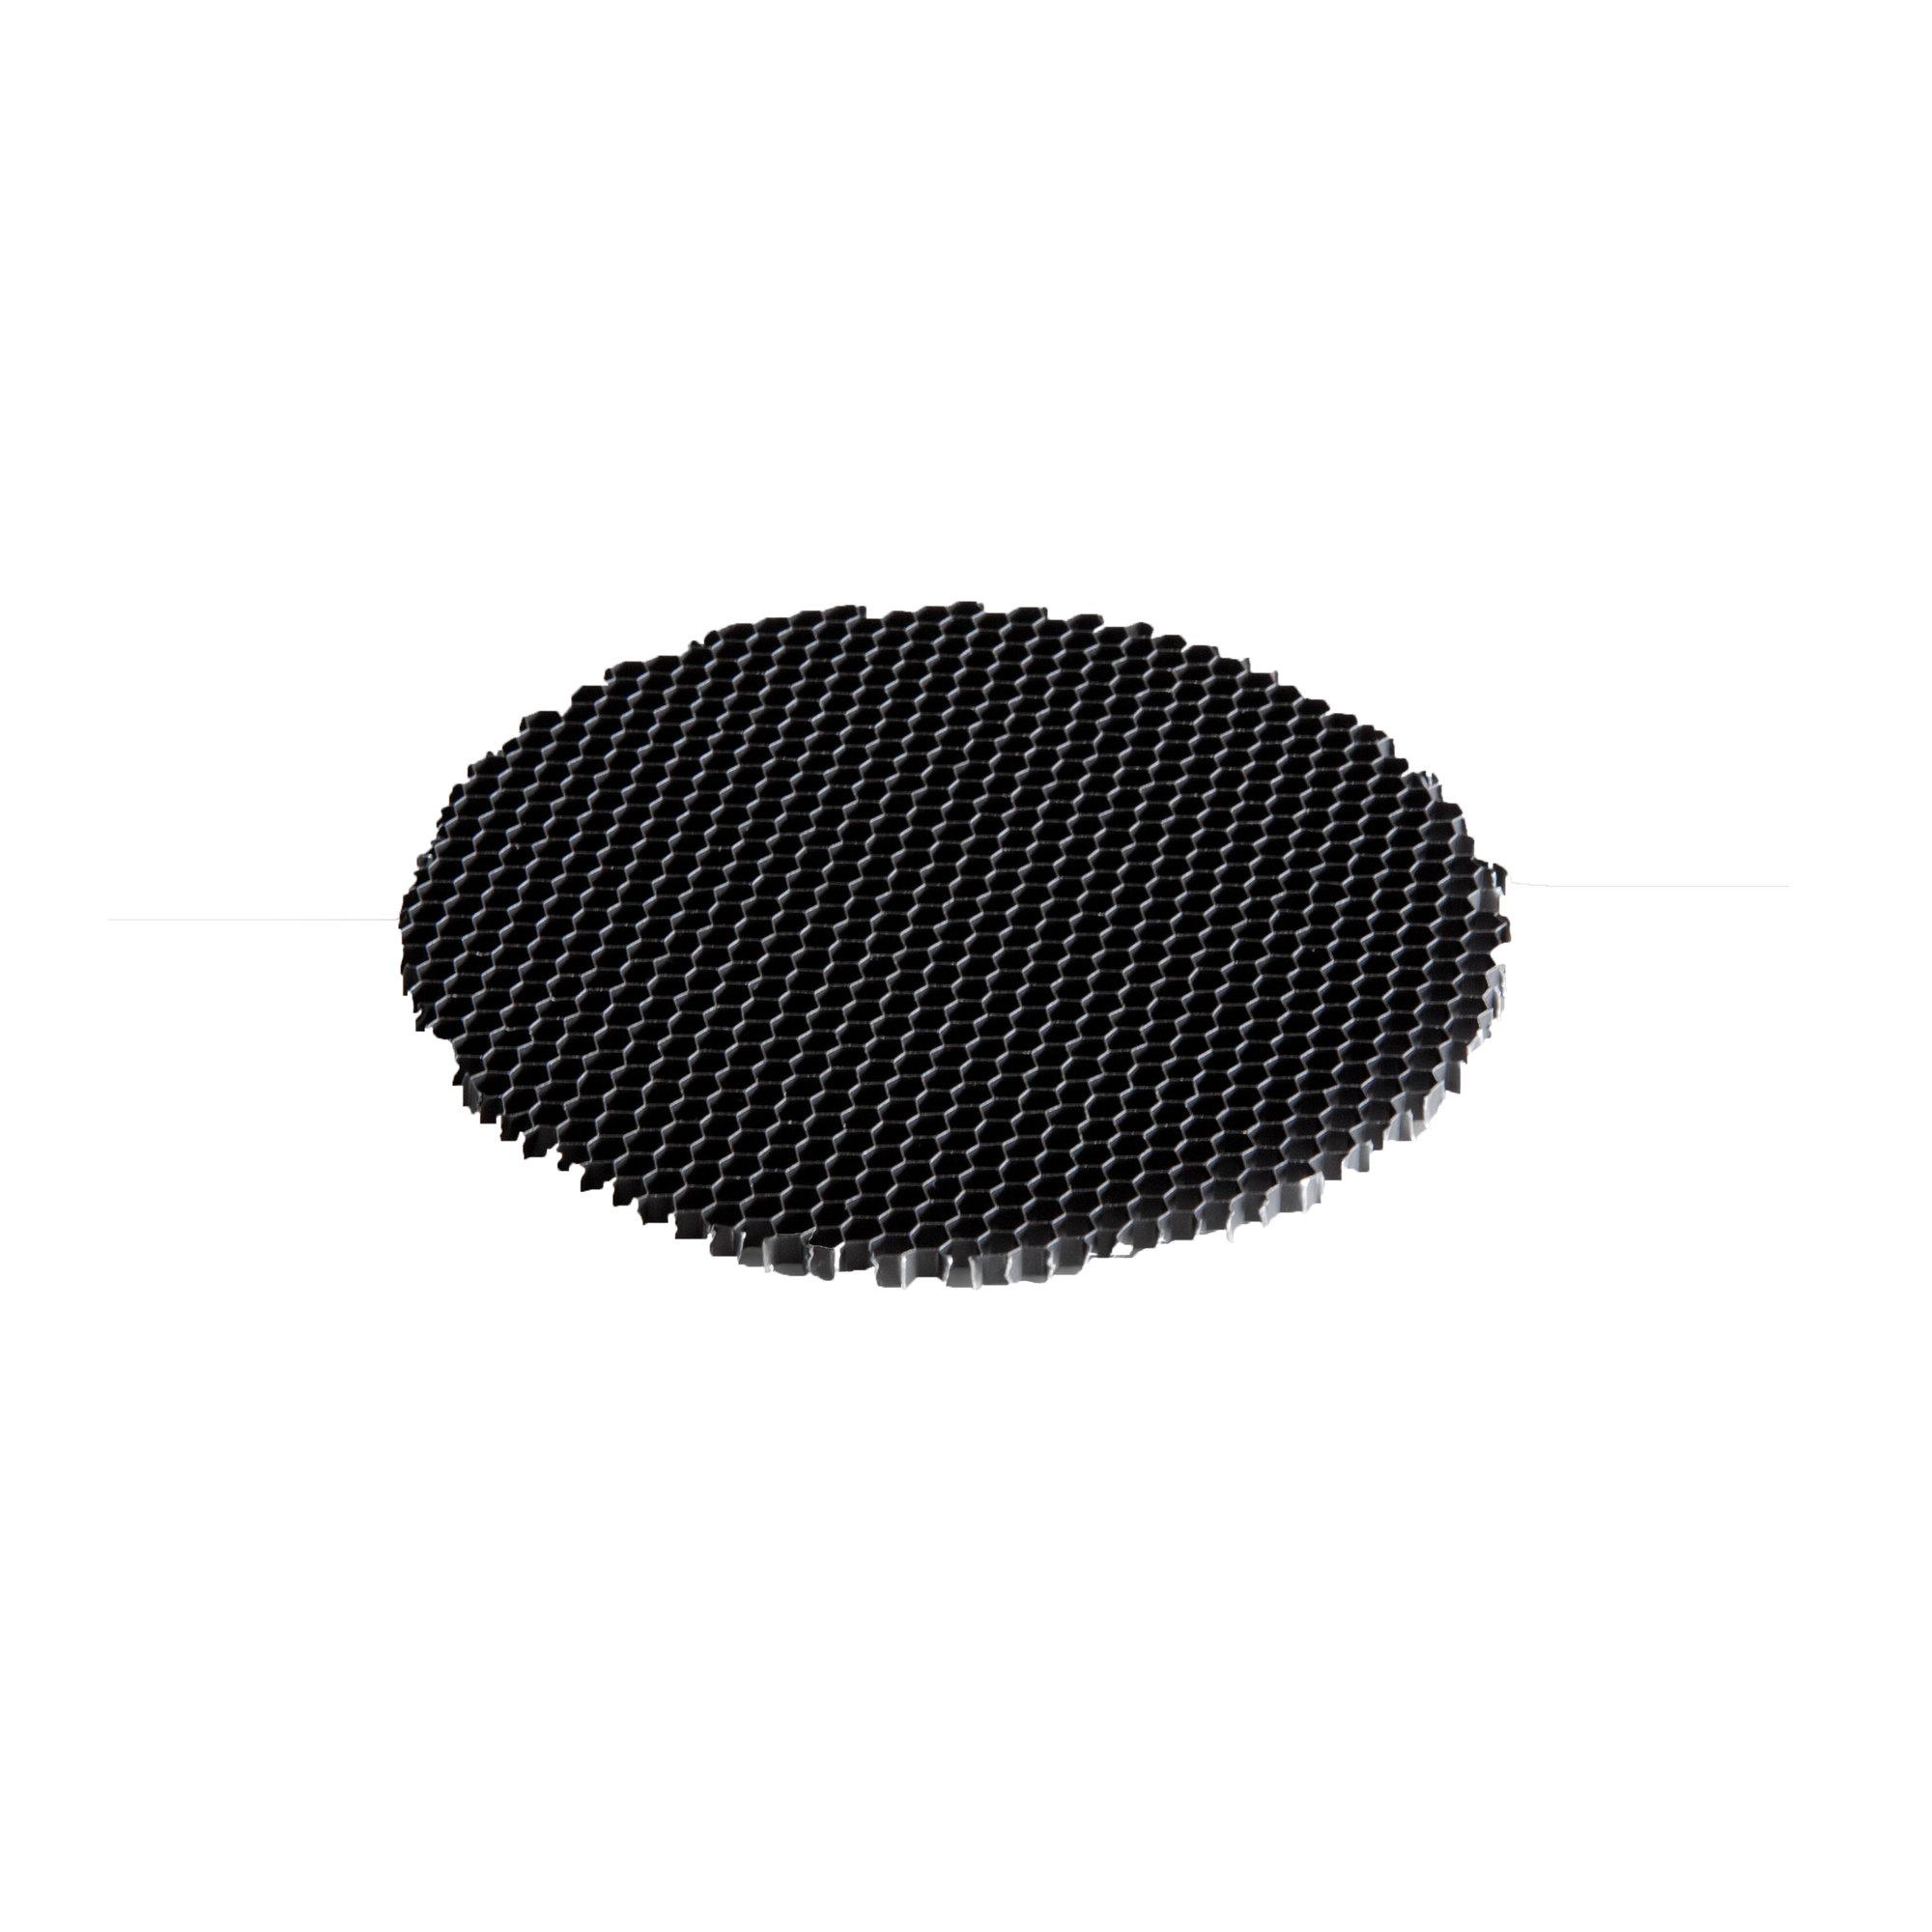 Vorsa 20 Honeycomb Insert Ø17.5mm